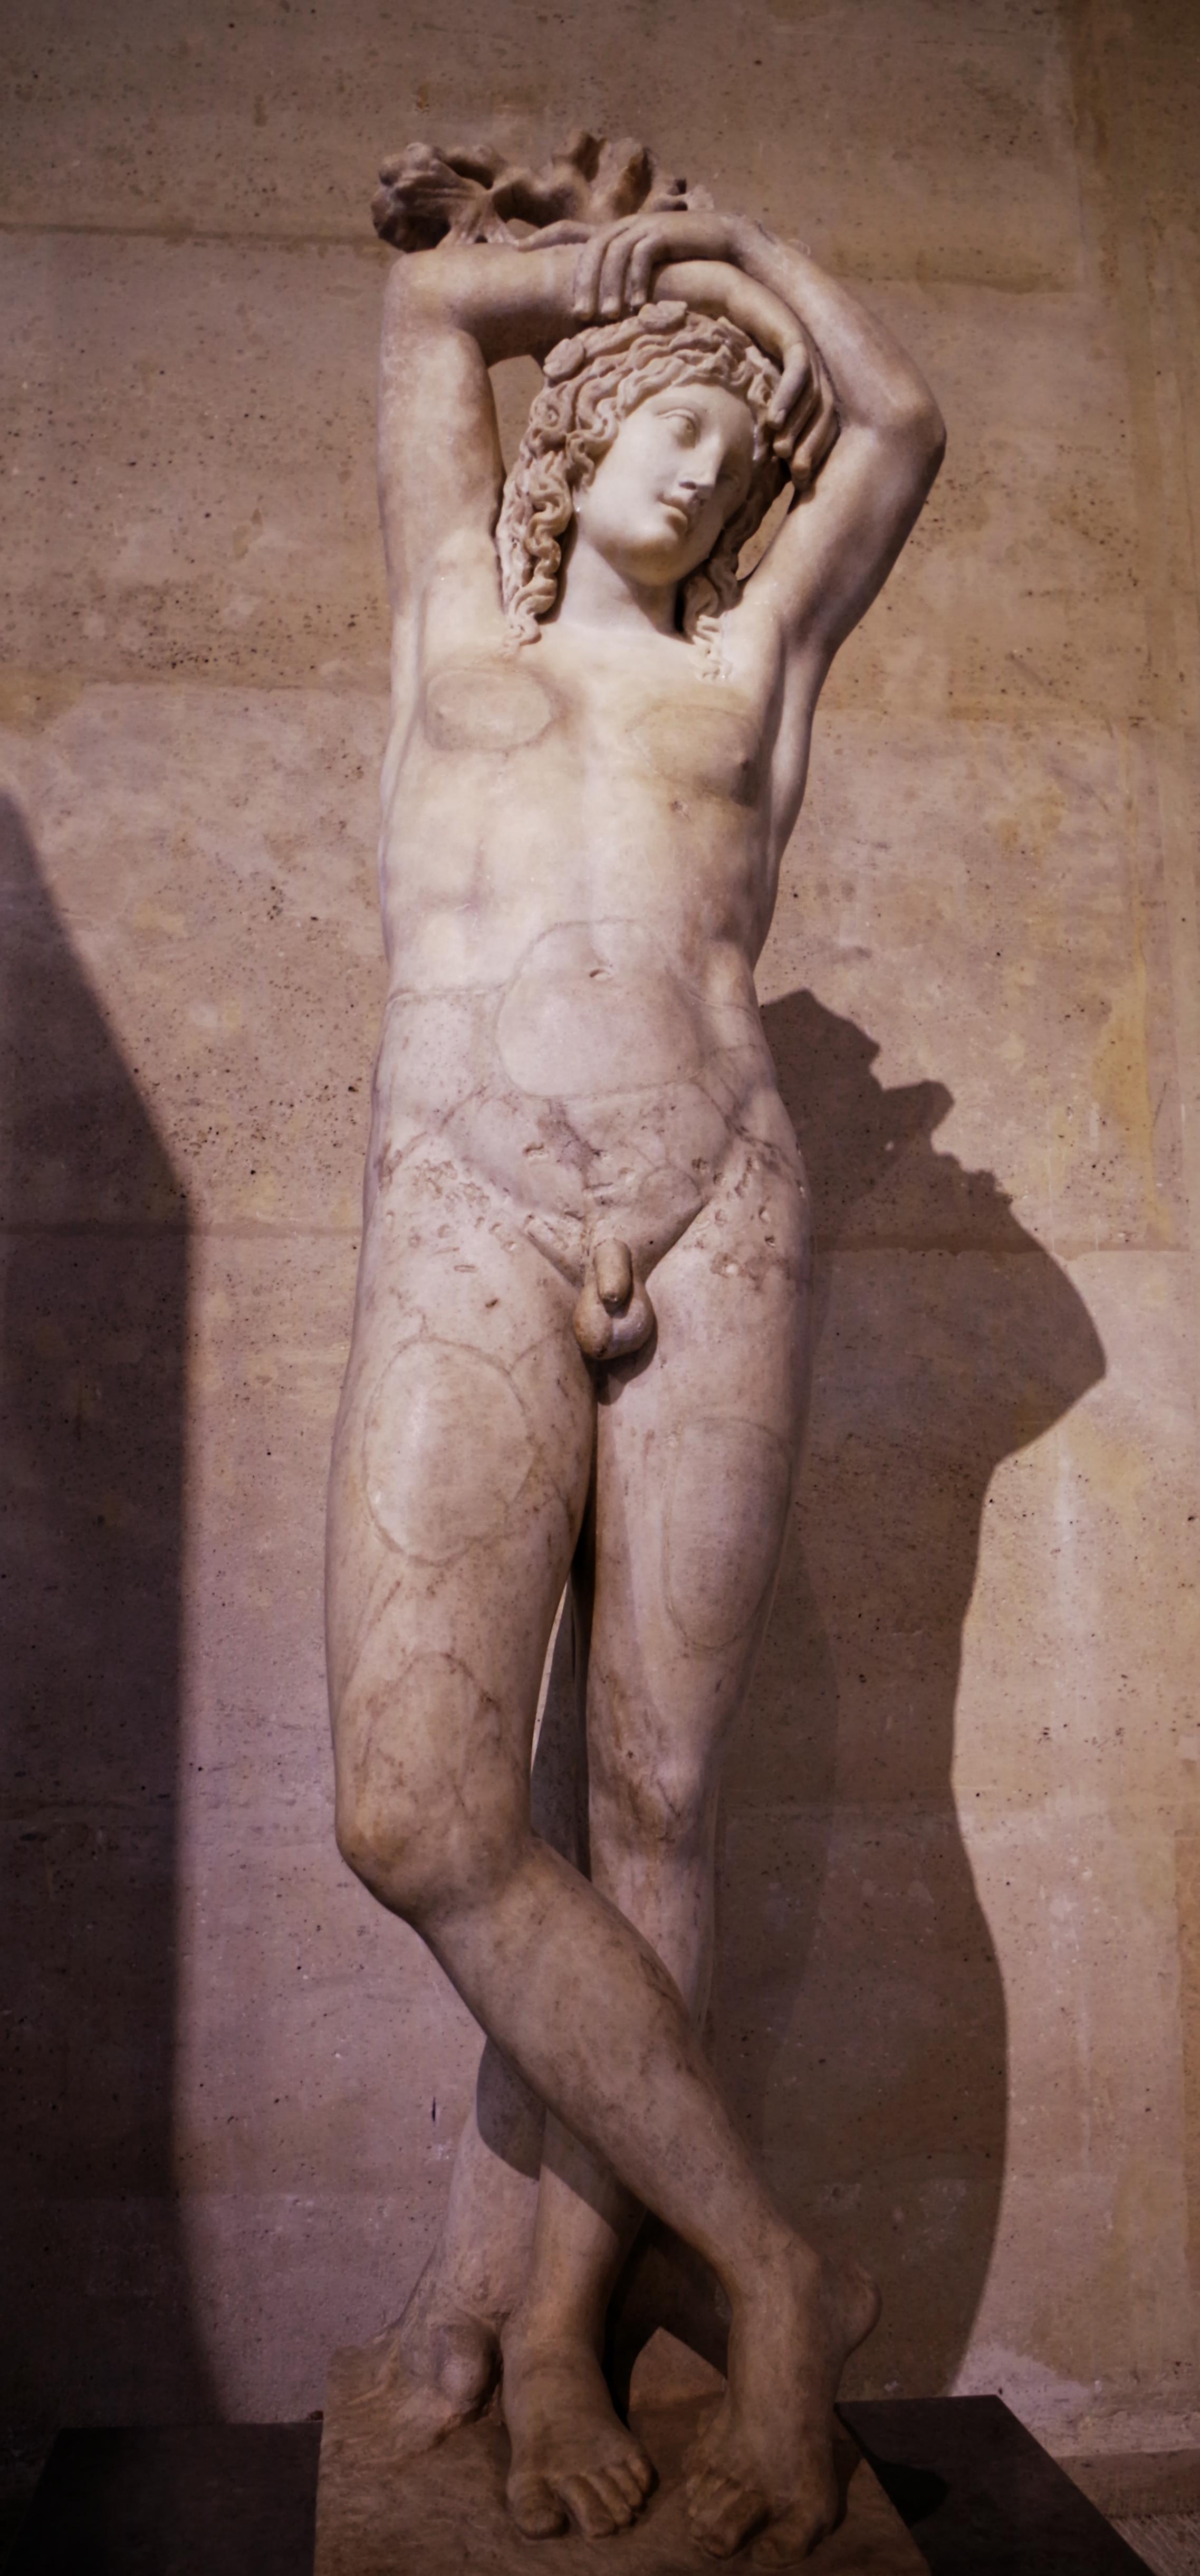 Hermaphrodite pics File:Narcisse - Hermaphrodite Mazarin MR 207 Ma 435.jpg